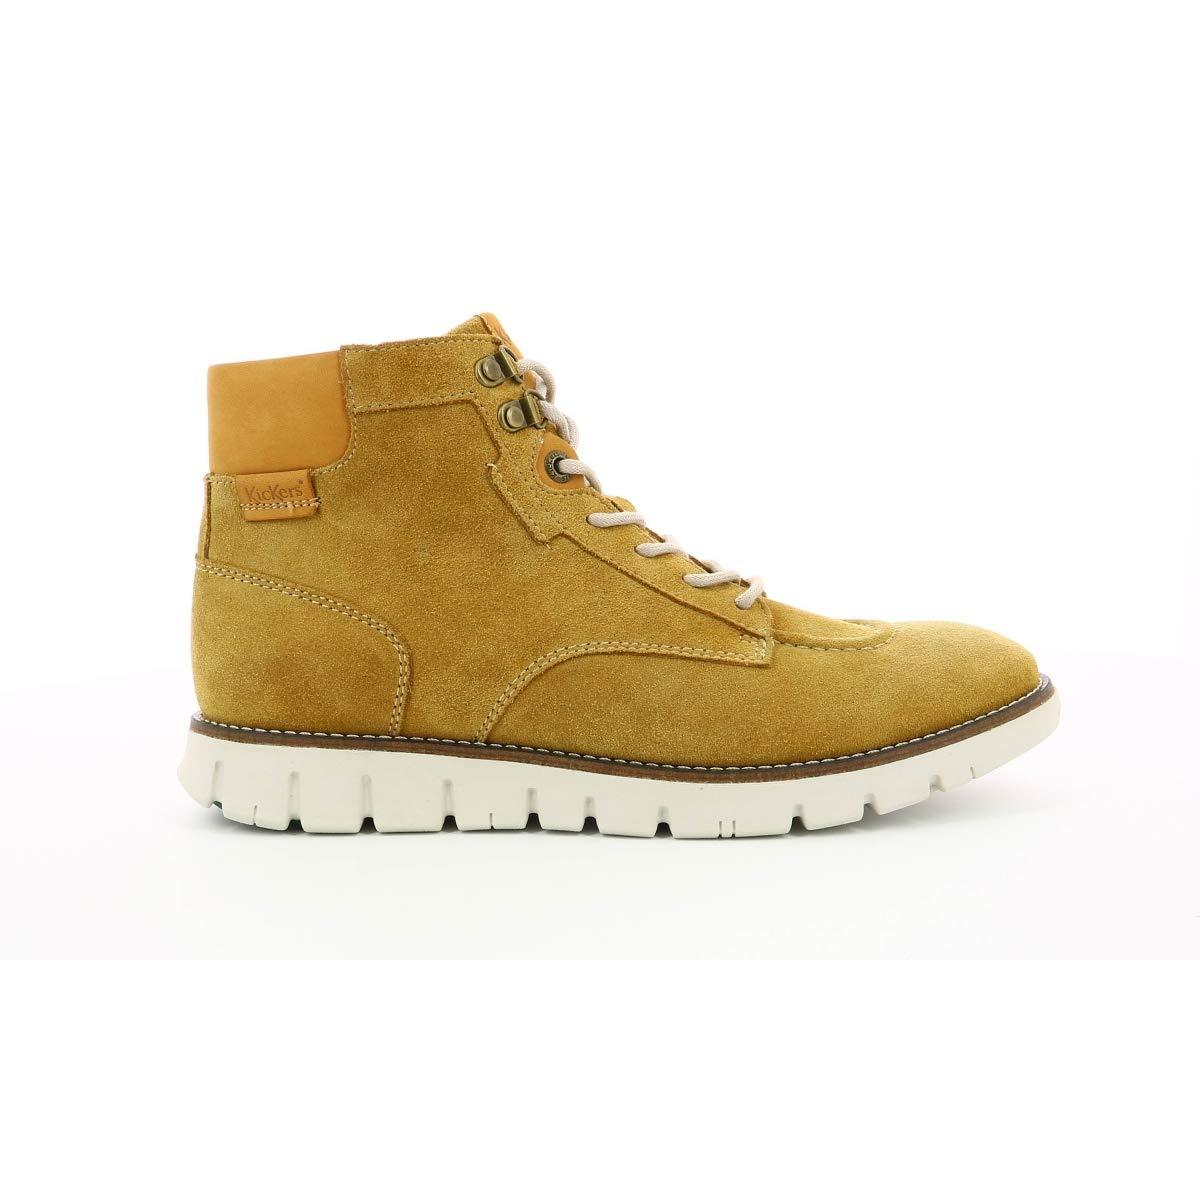 7c75f4741ed0bd Kicktaina, Sneakers Haute Homme,: Amazon.fr: Chaussures et Sacs